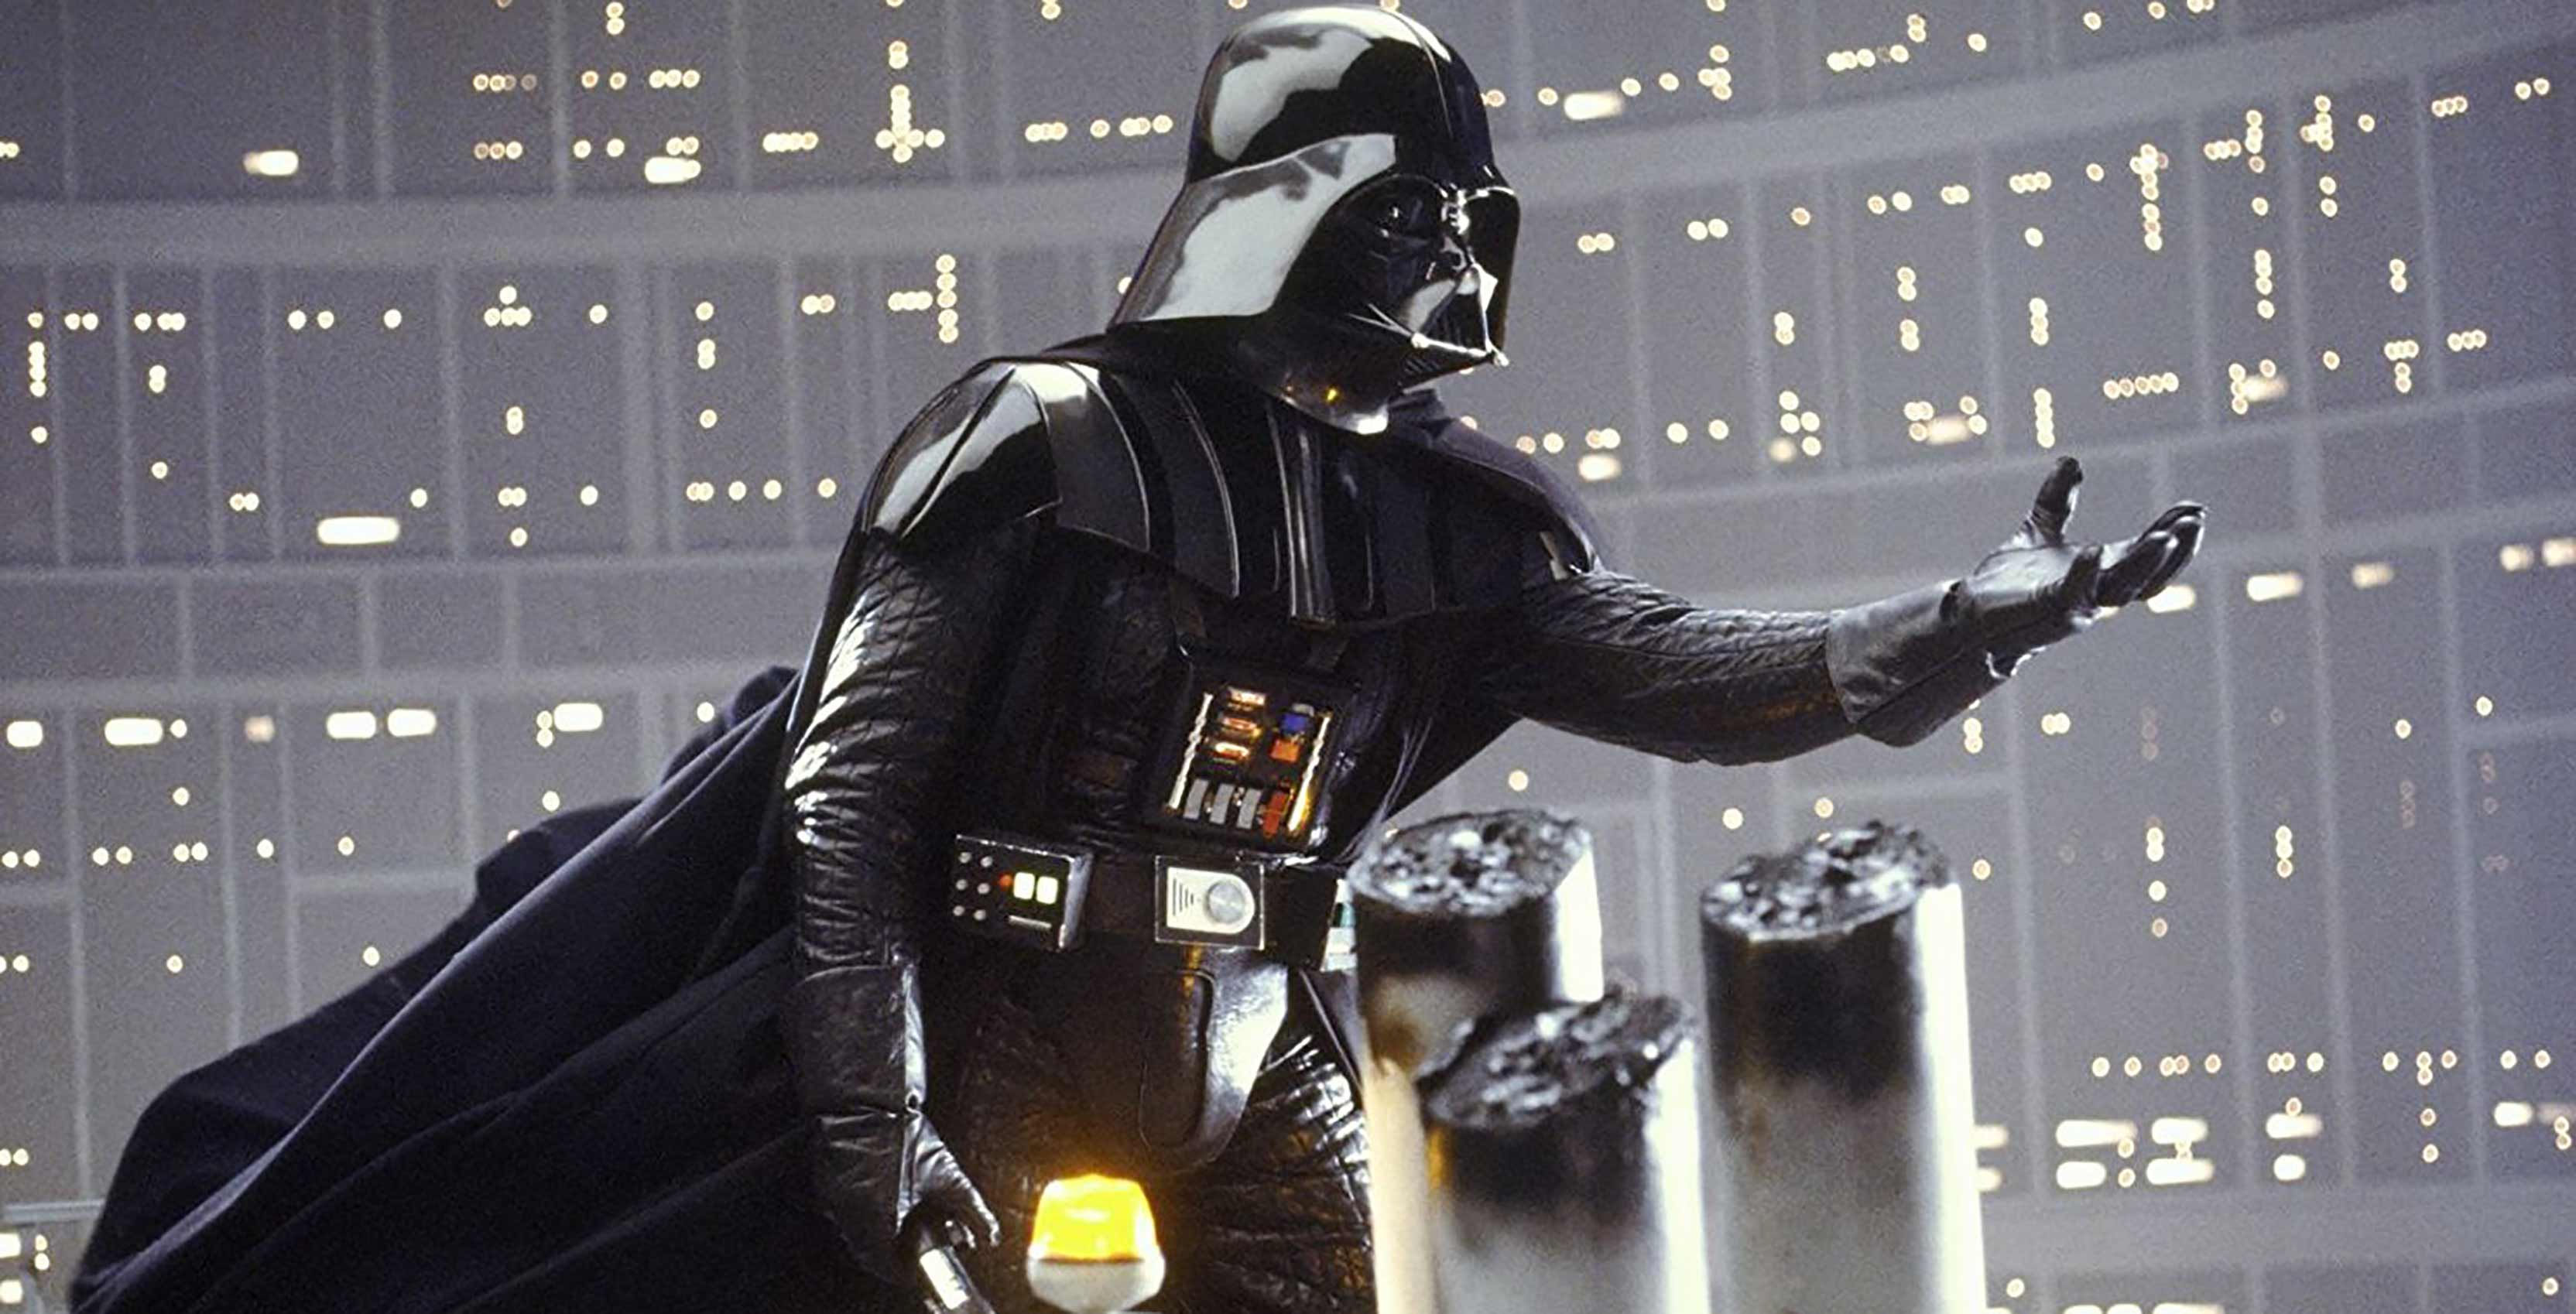 Star Wars Darth Vader Cloud City